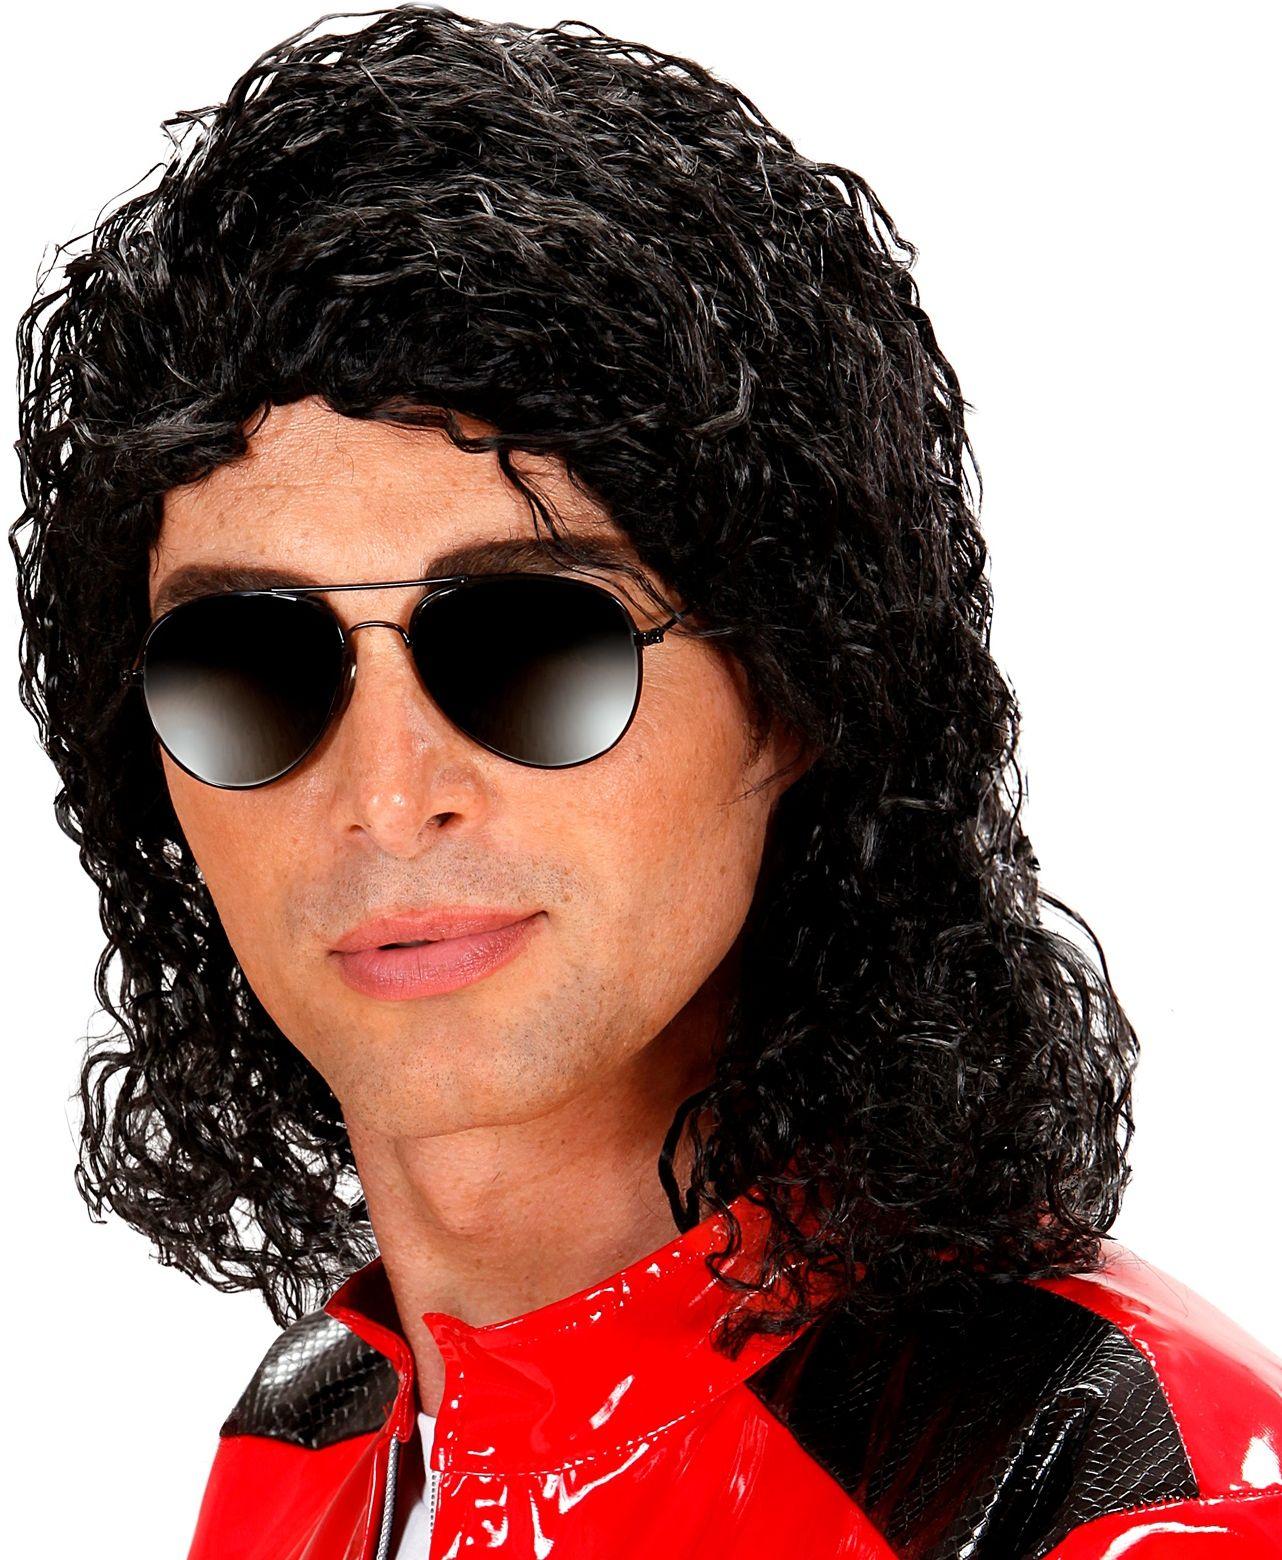 Zwarte Michael Jackson pruik